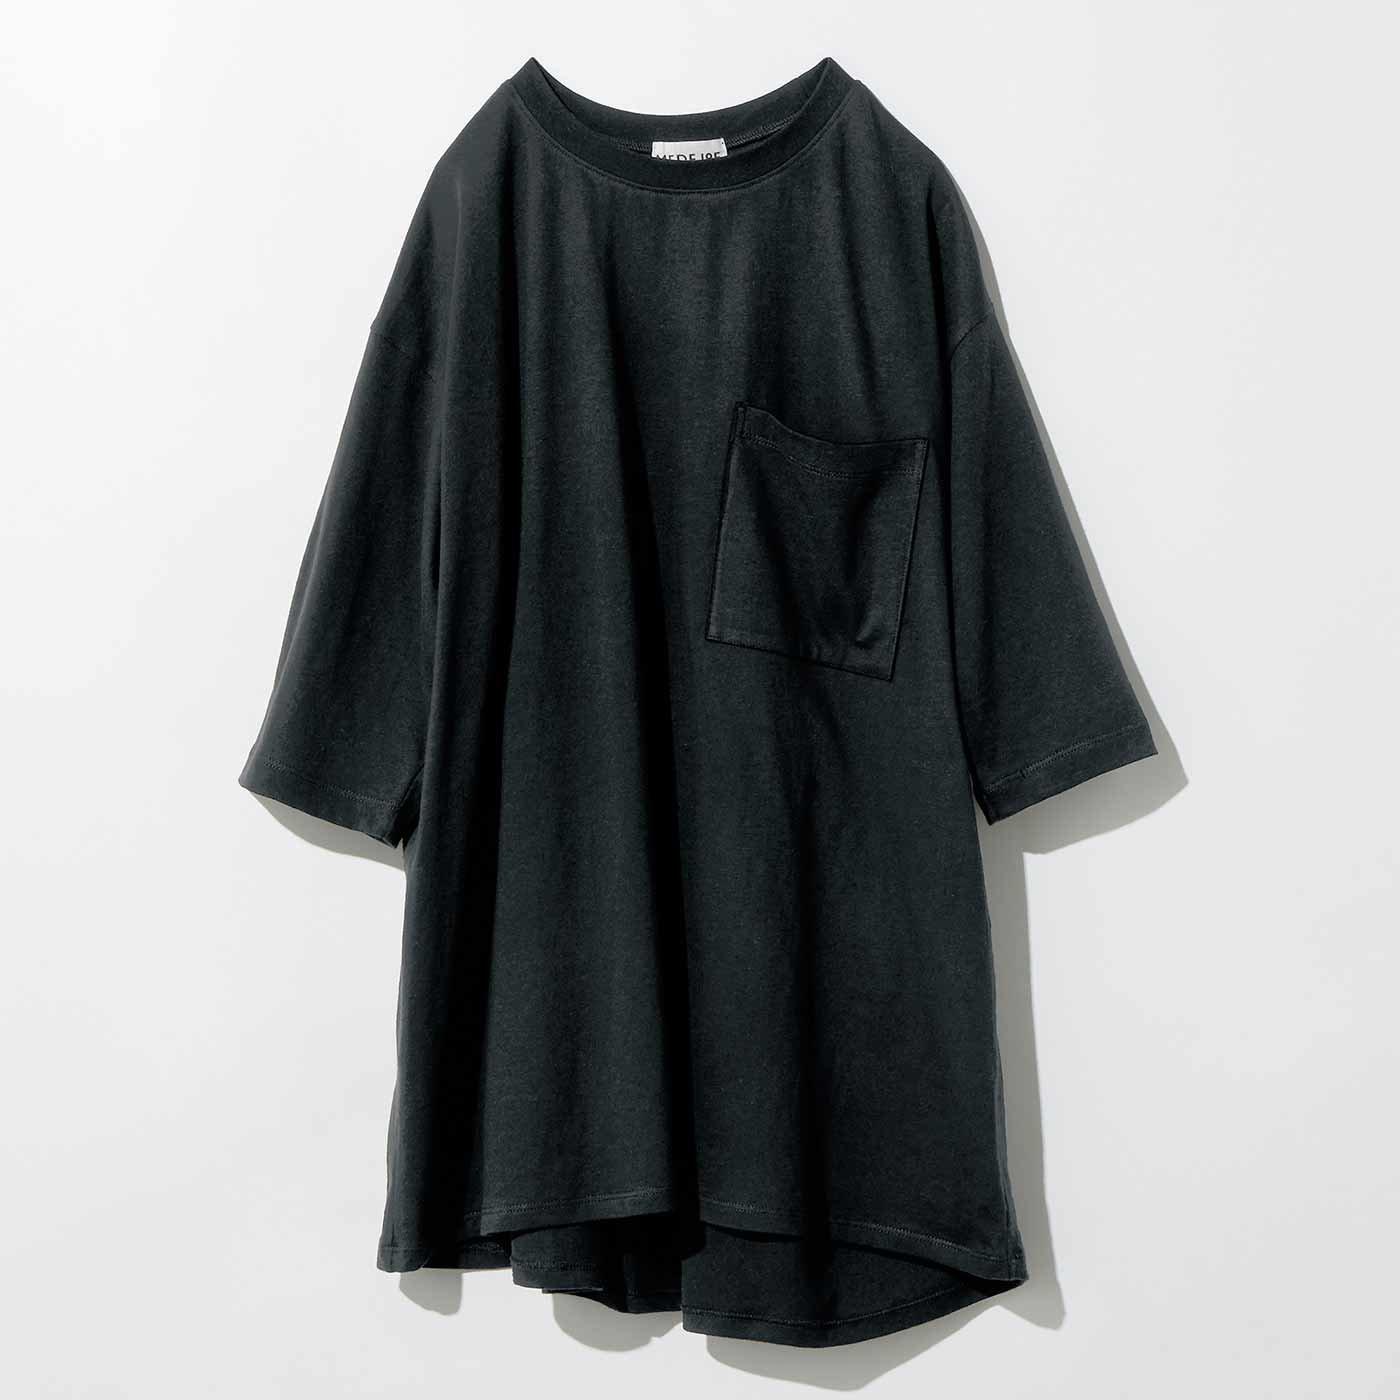 MEDE19F バックデザインのリメイク風Tシャツ〈ブラック〉